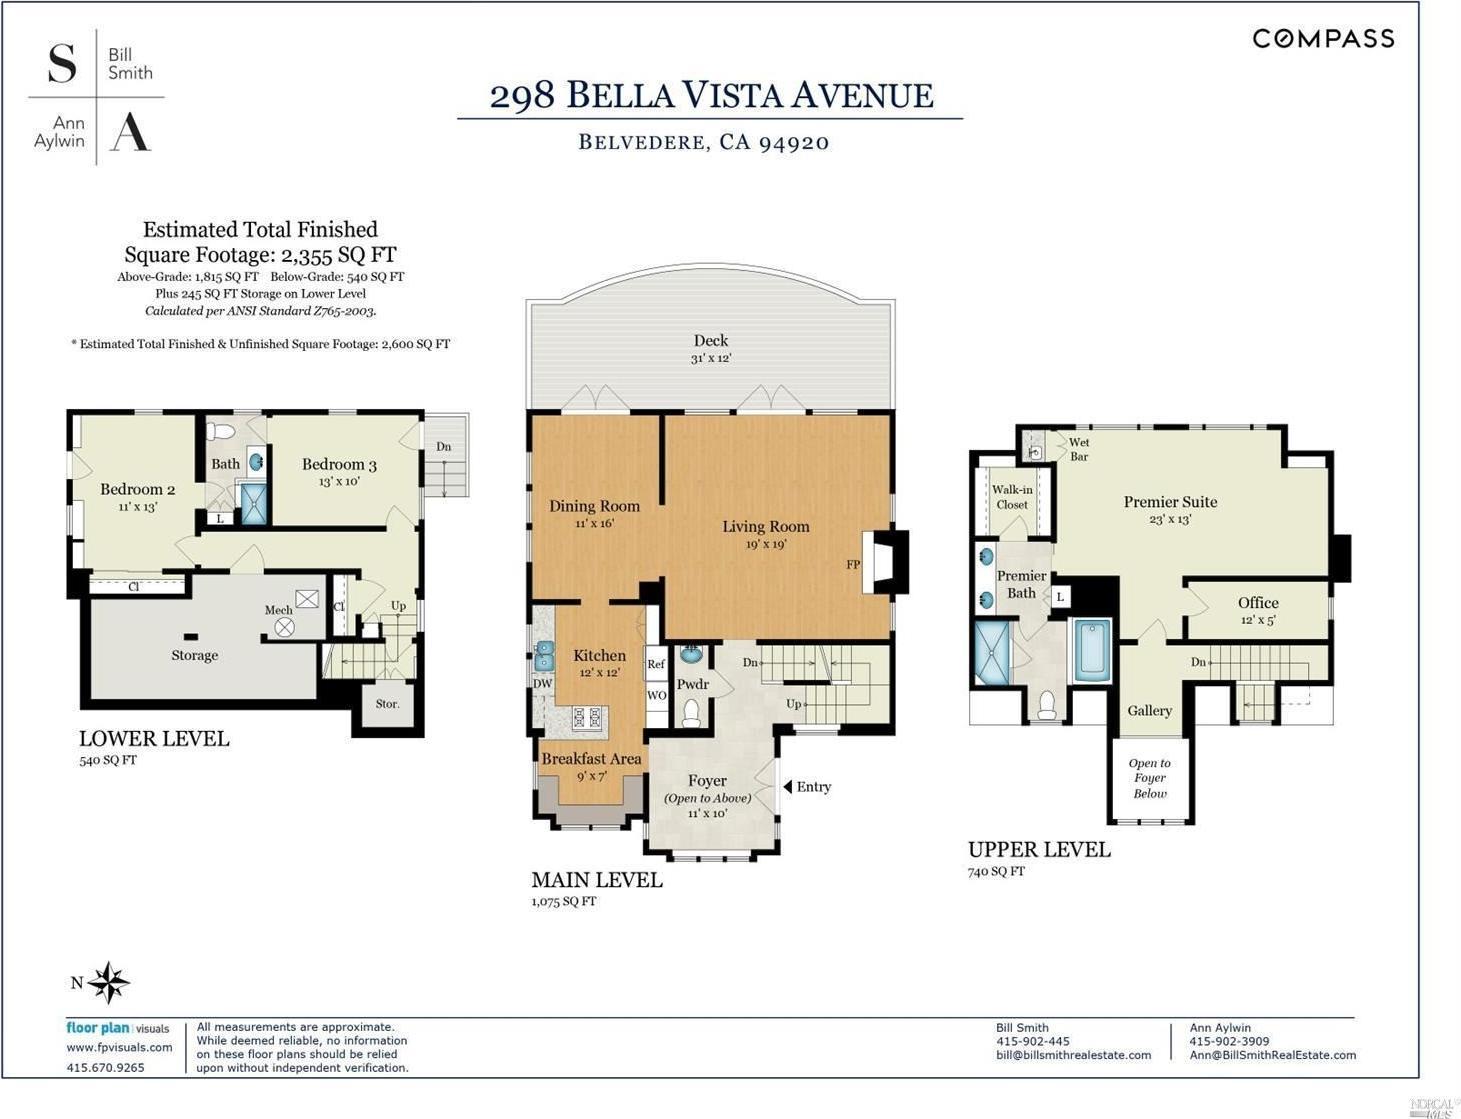 298 Bella Vista Avenue photo